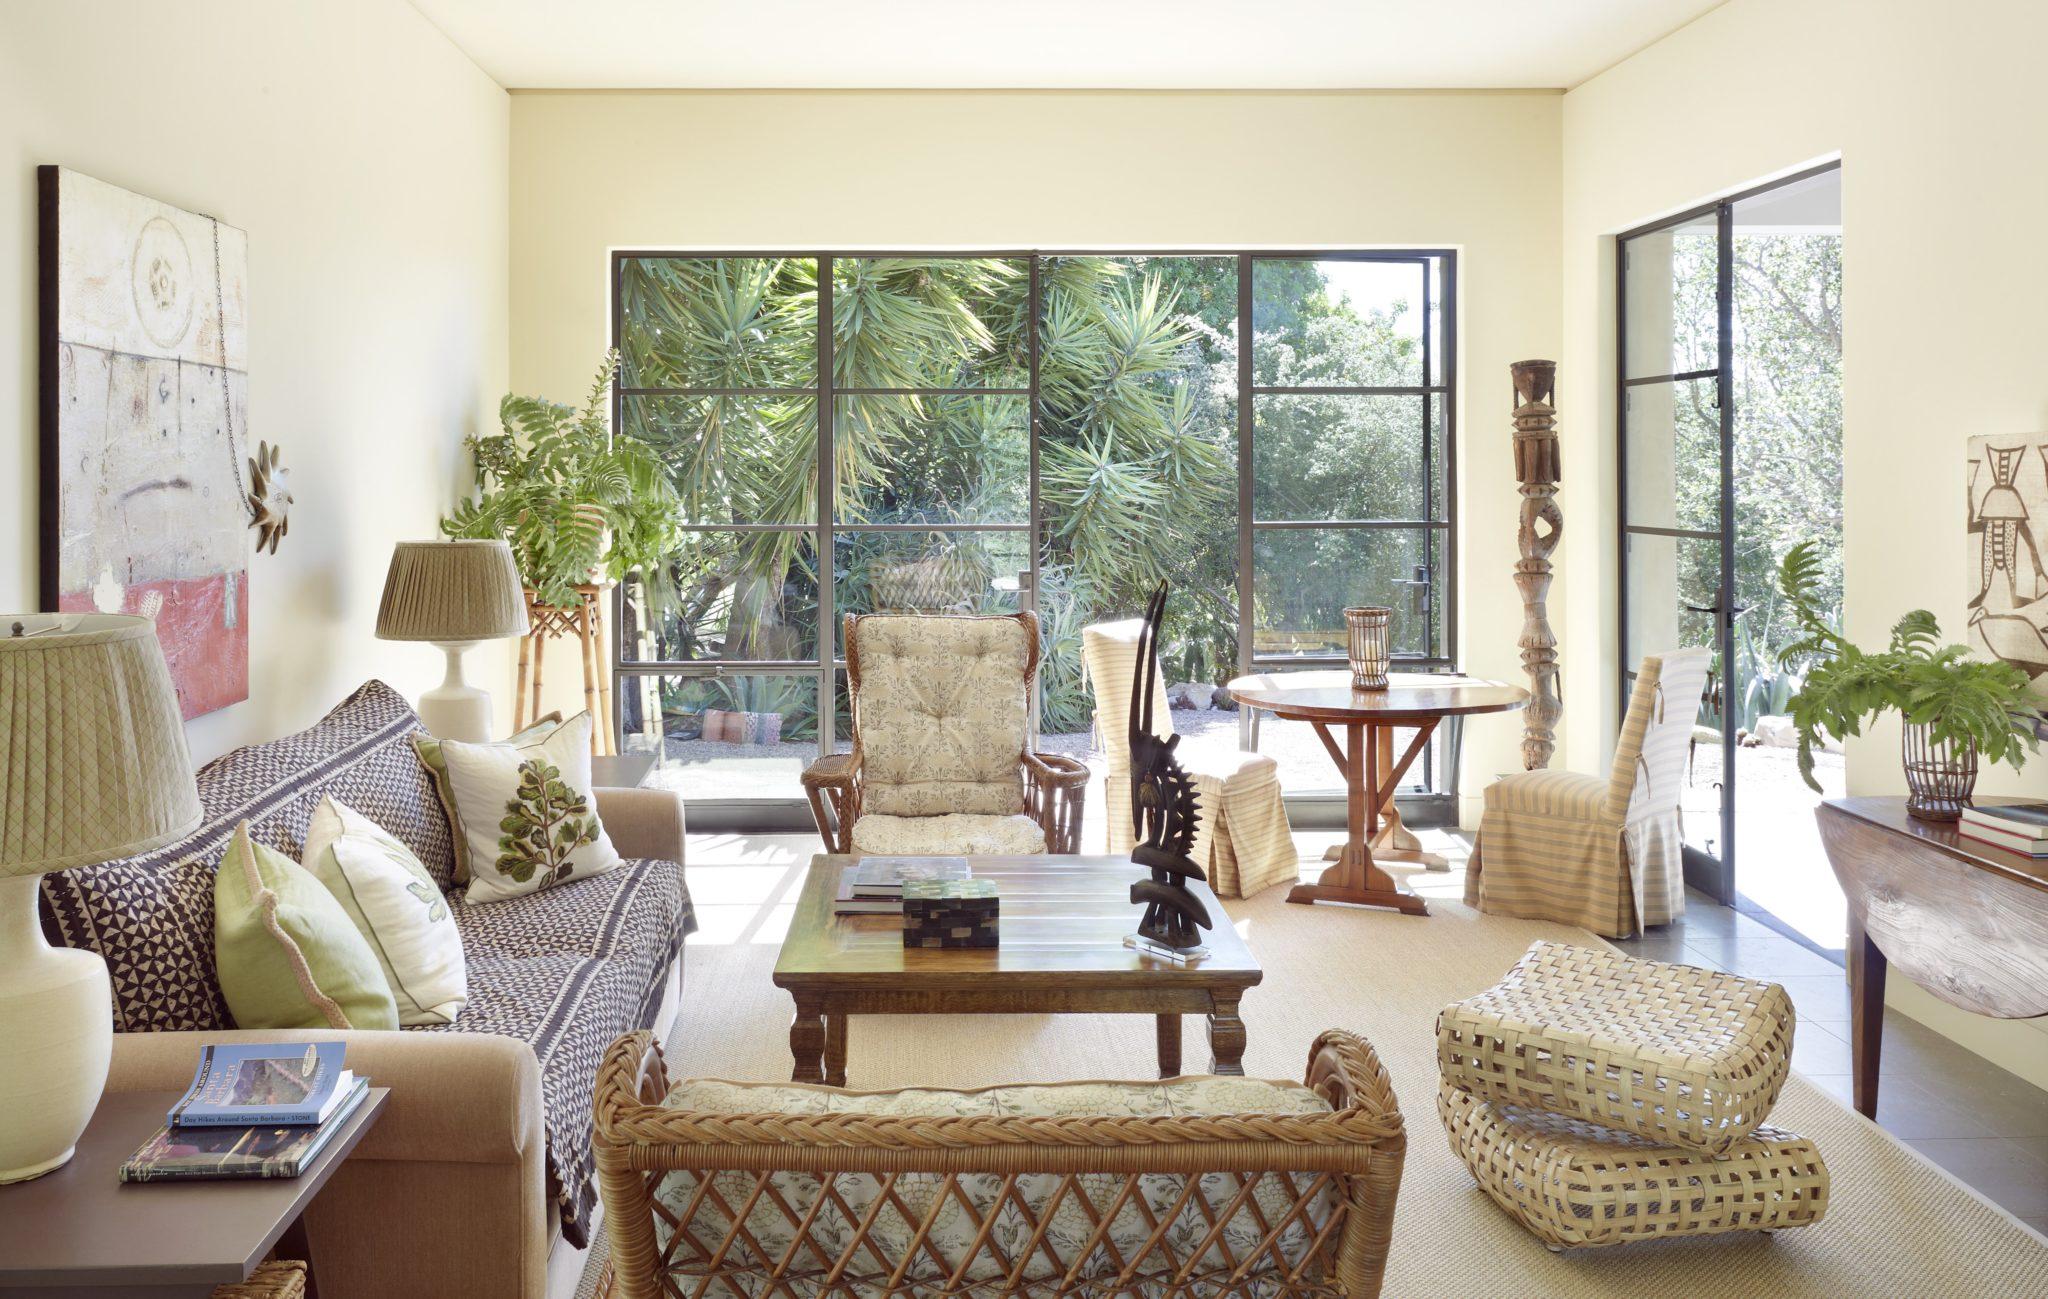 Bright living room with natural materials, doors onto garden by Suzanne Rheinstein & Associates